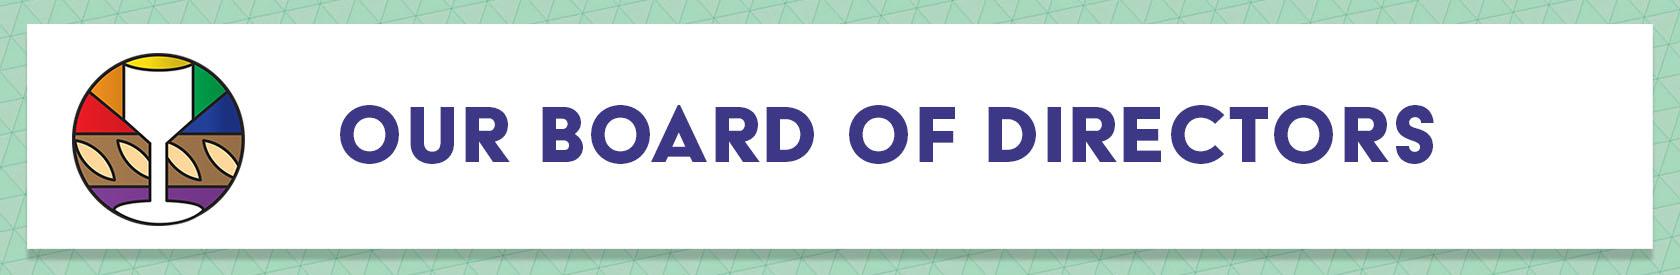 National Board of Directors